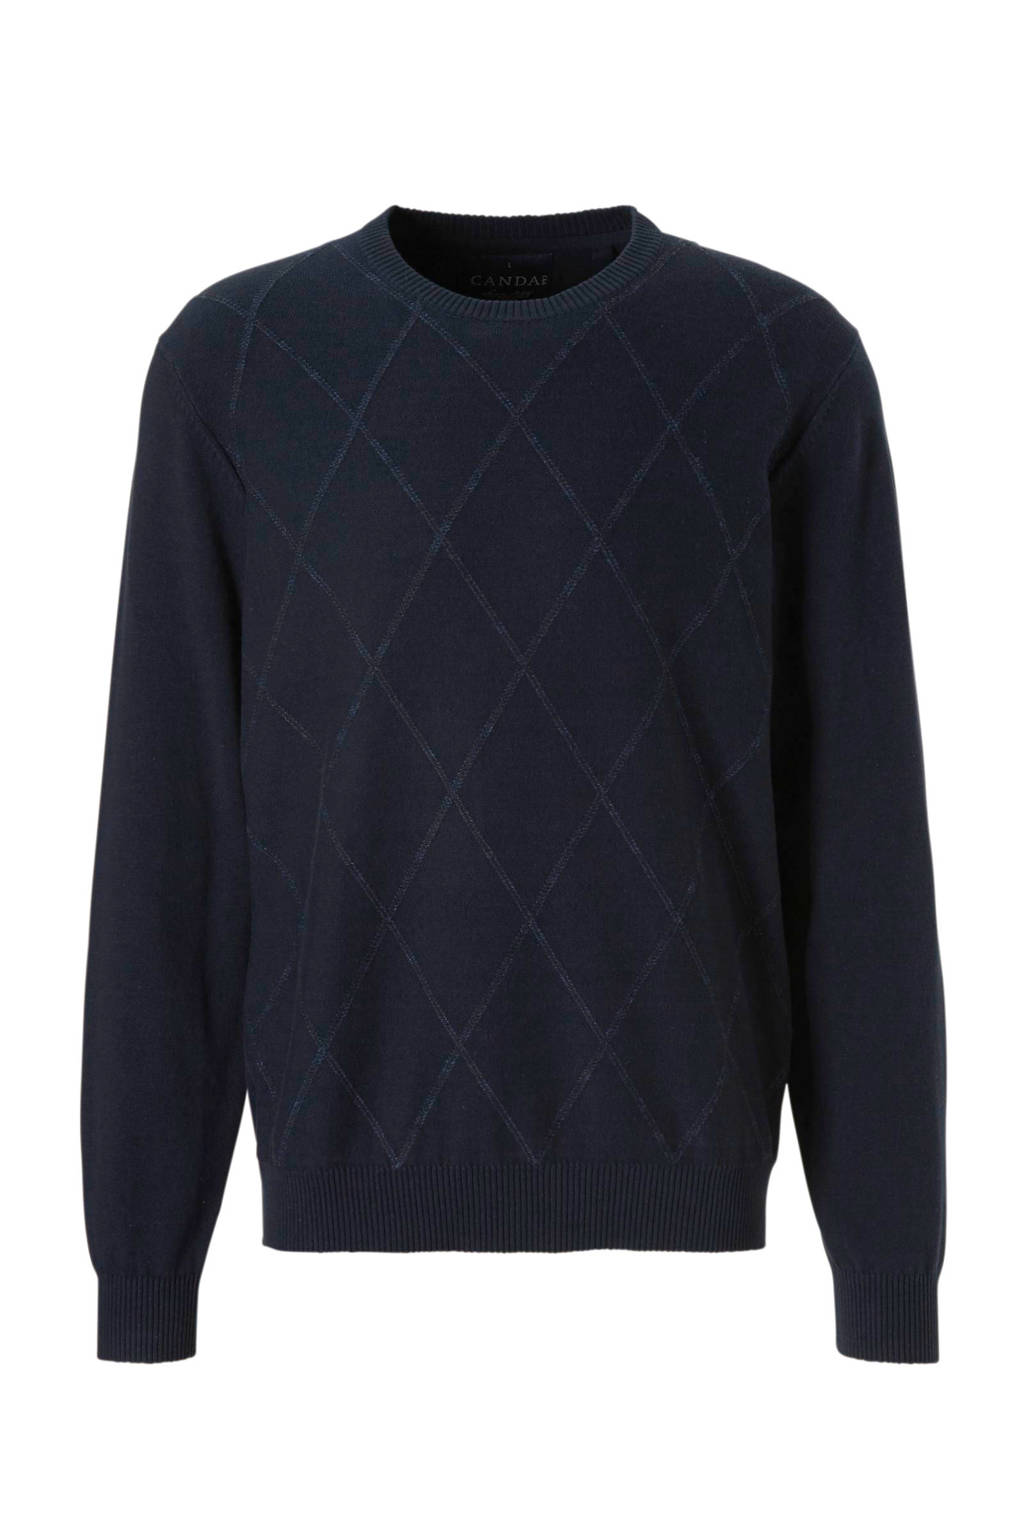 C&A Canda trui donkerblauw, Donkerblauw